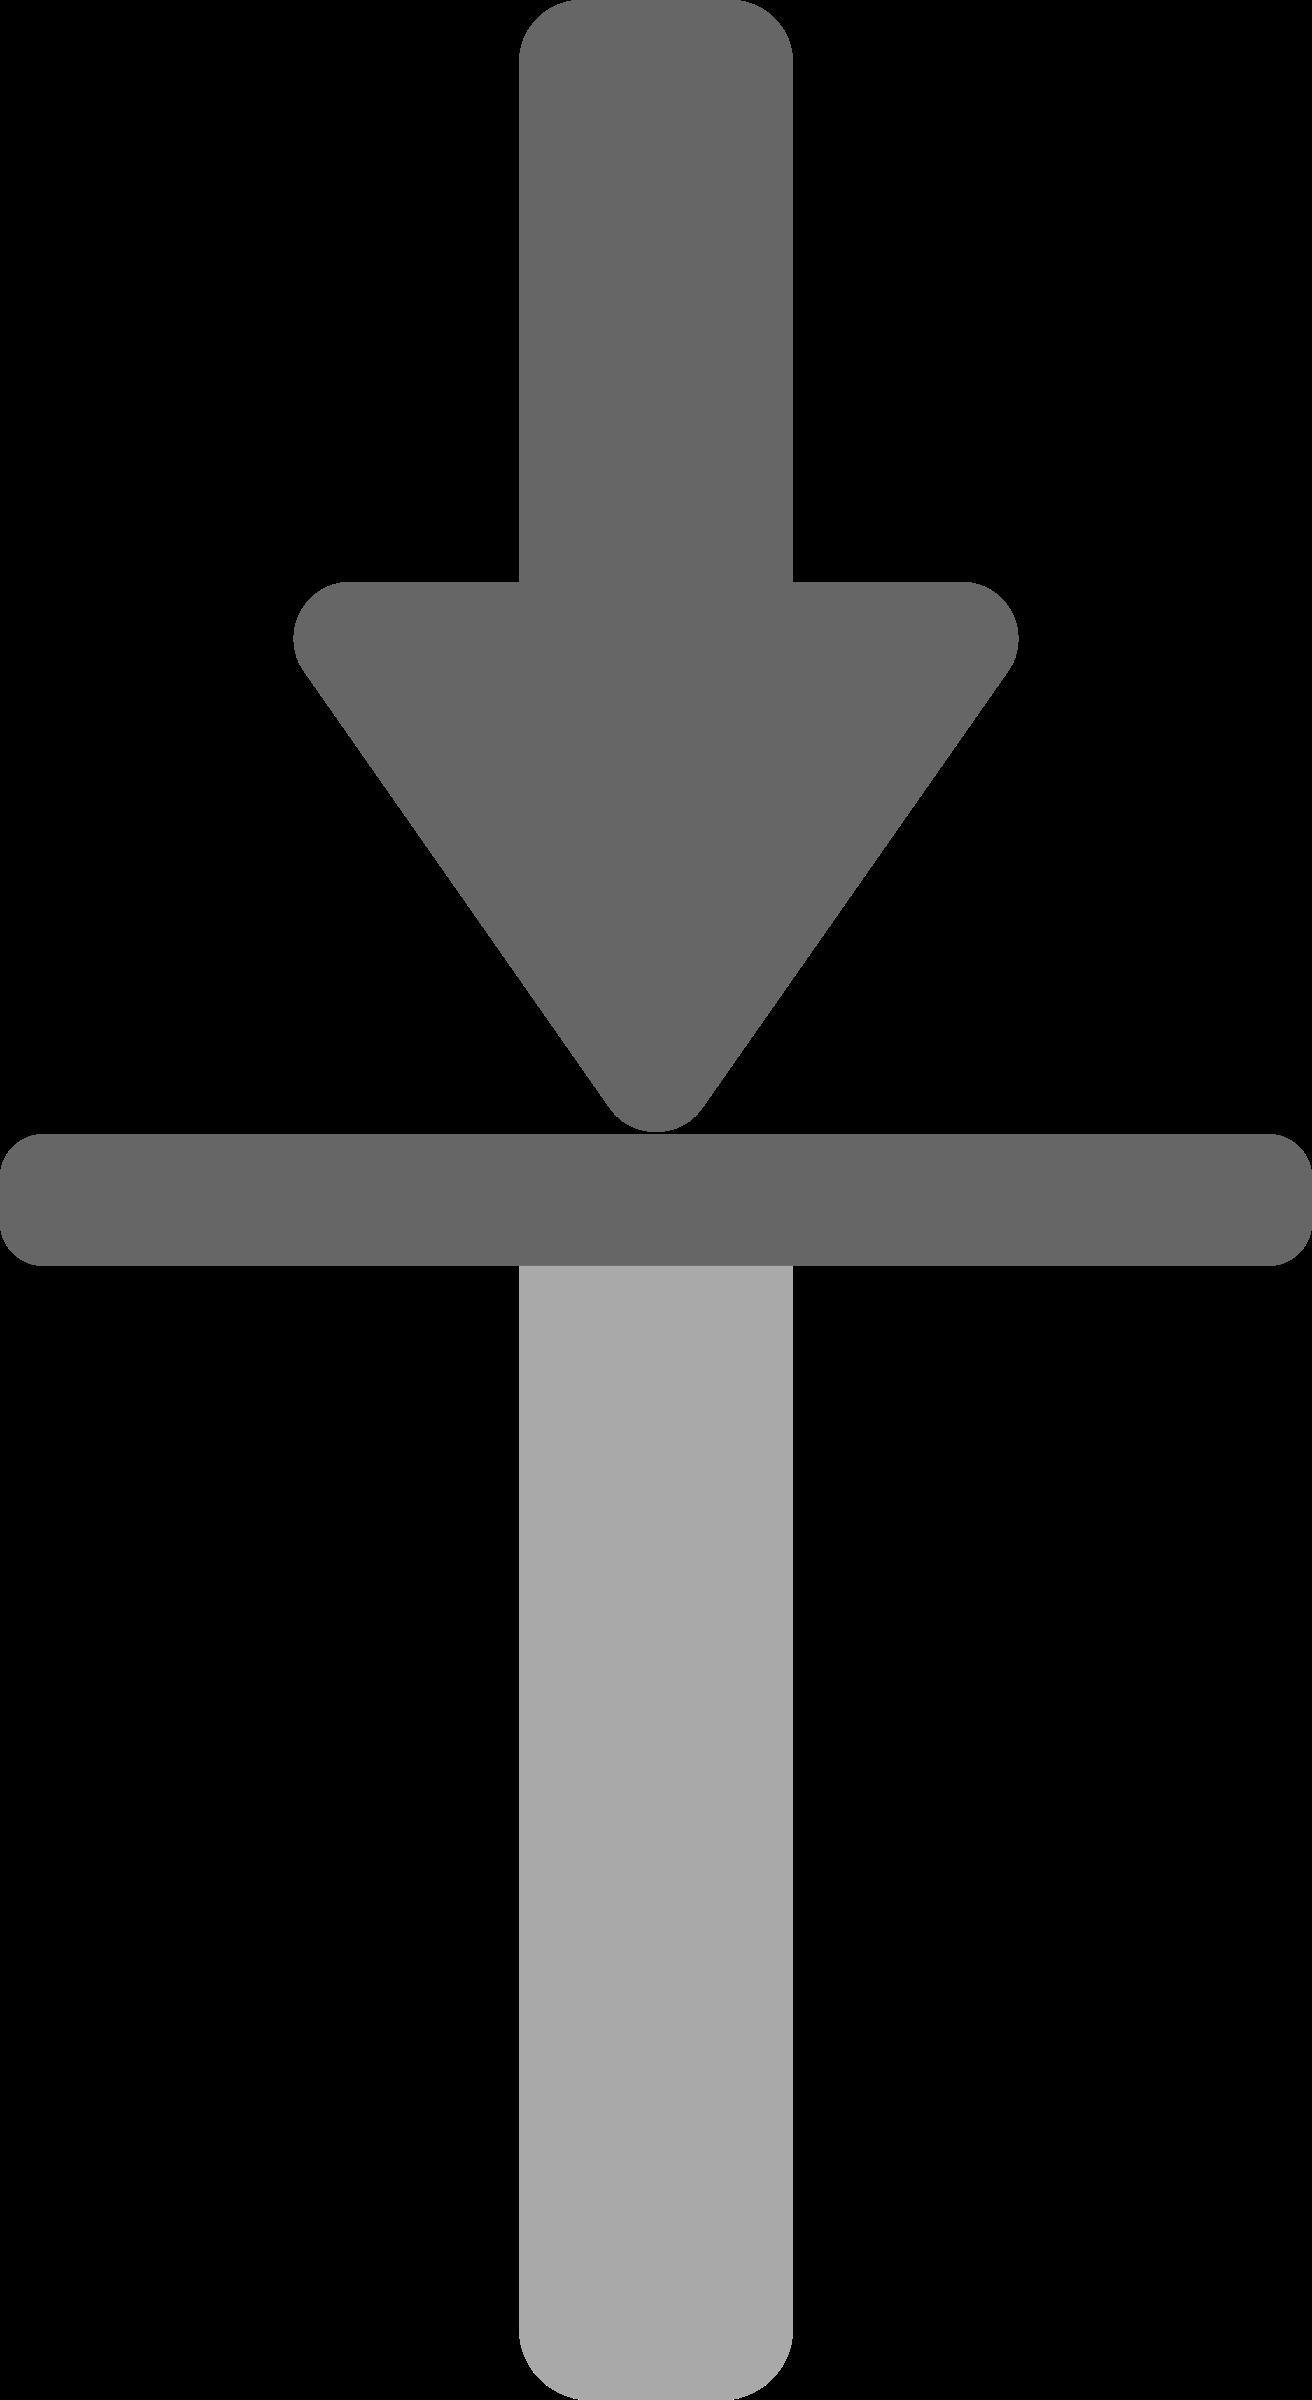 Input icon big image. Clipart road arrow